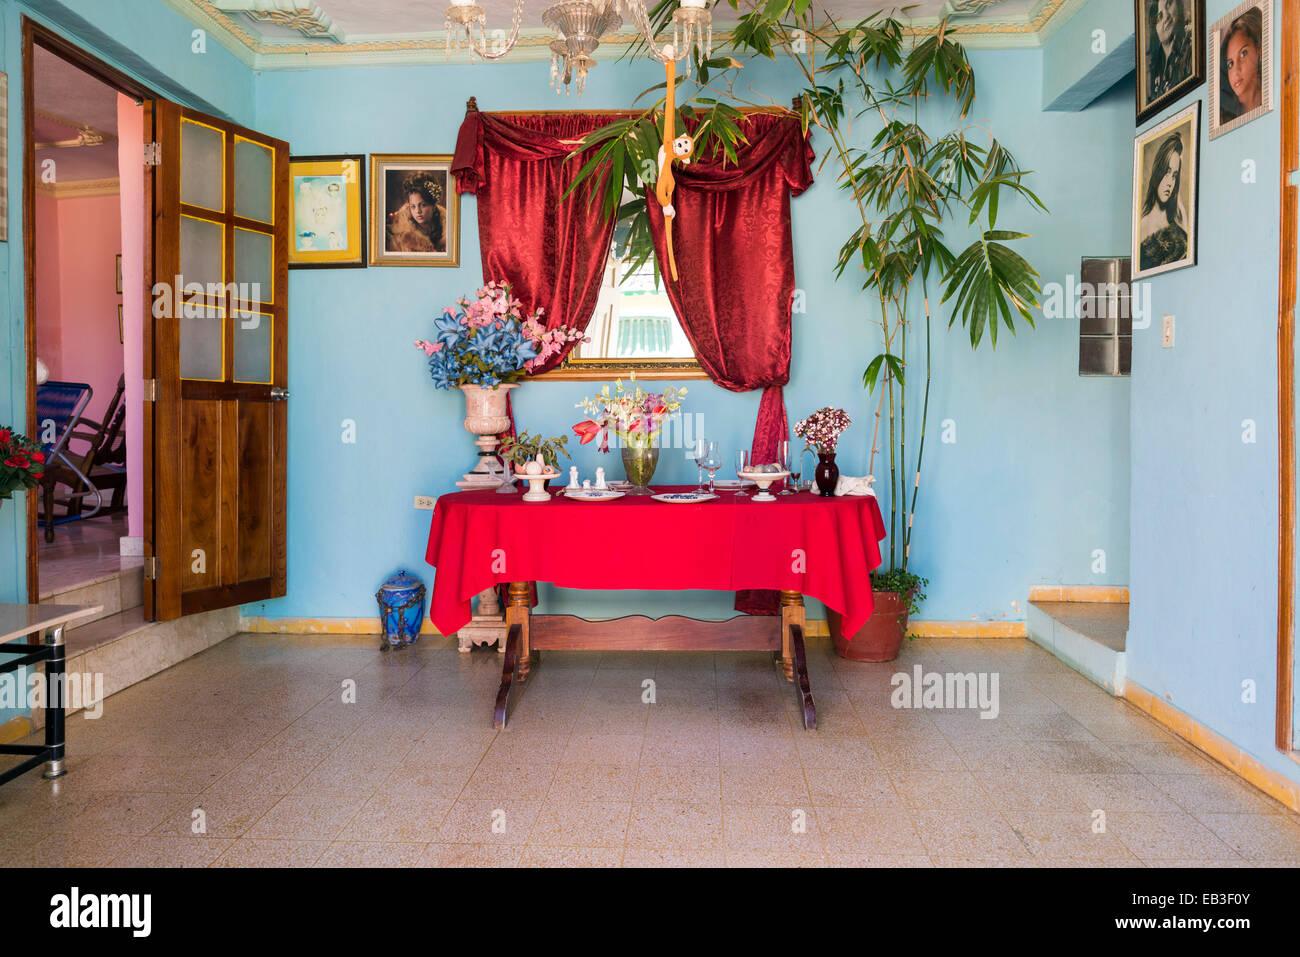 Cuban Living Room Stock Photos & Cuban Living Room Stock Images - Alamy